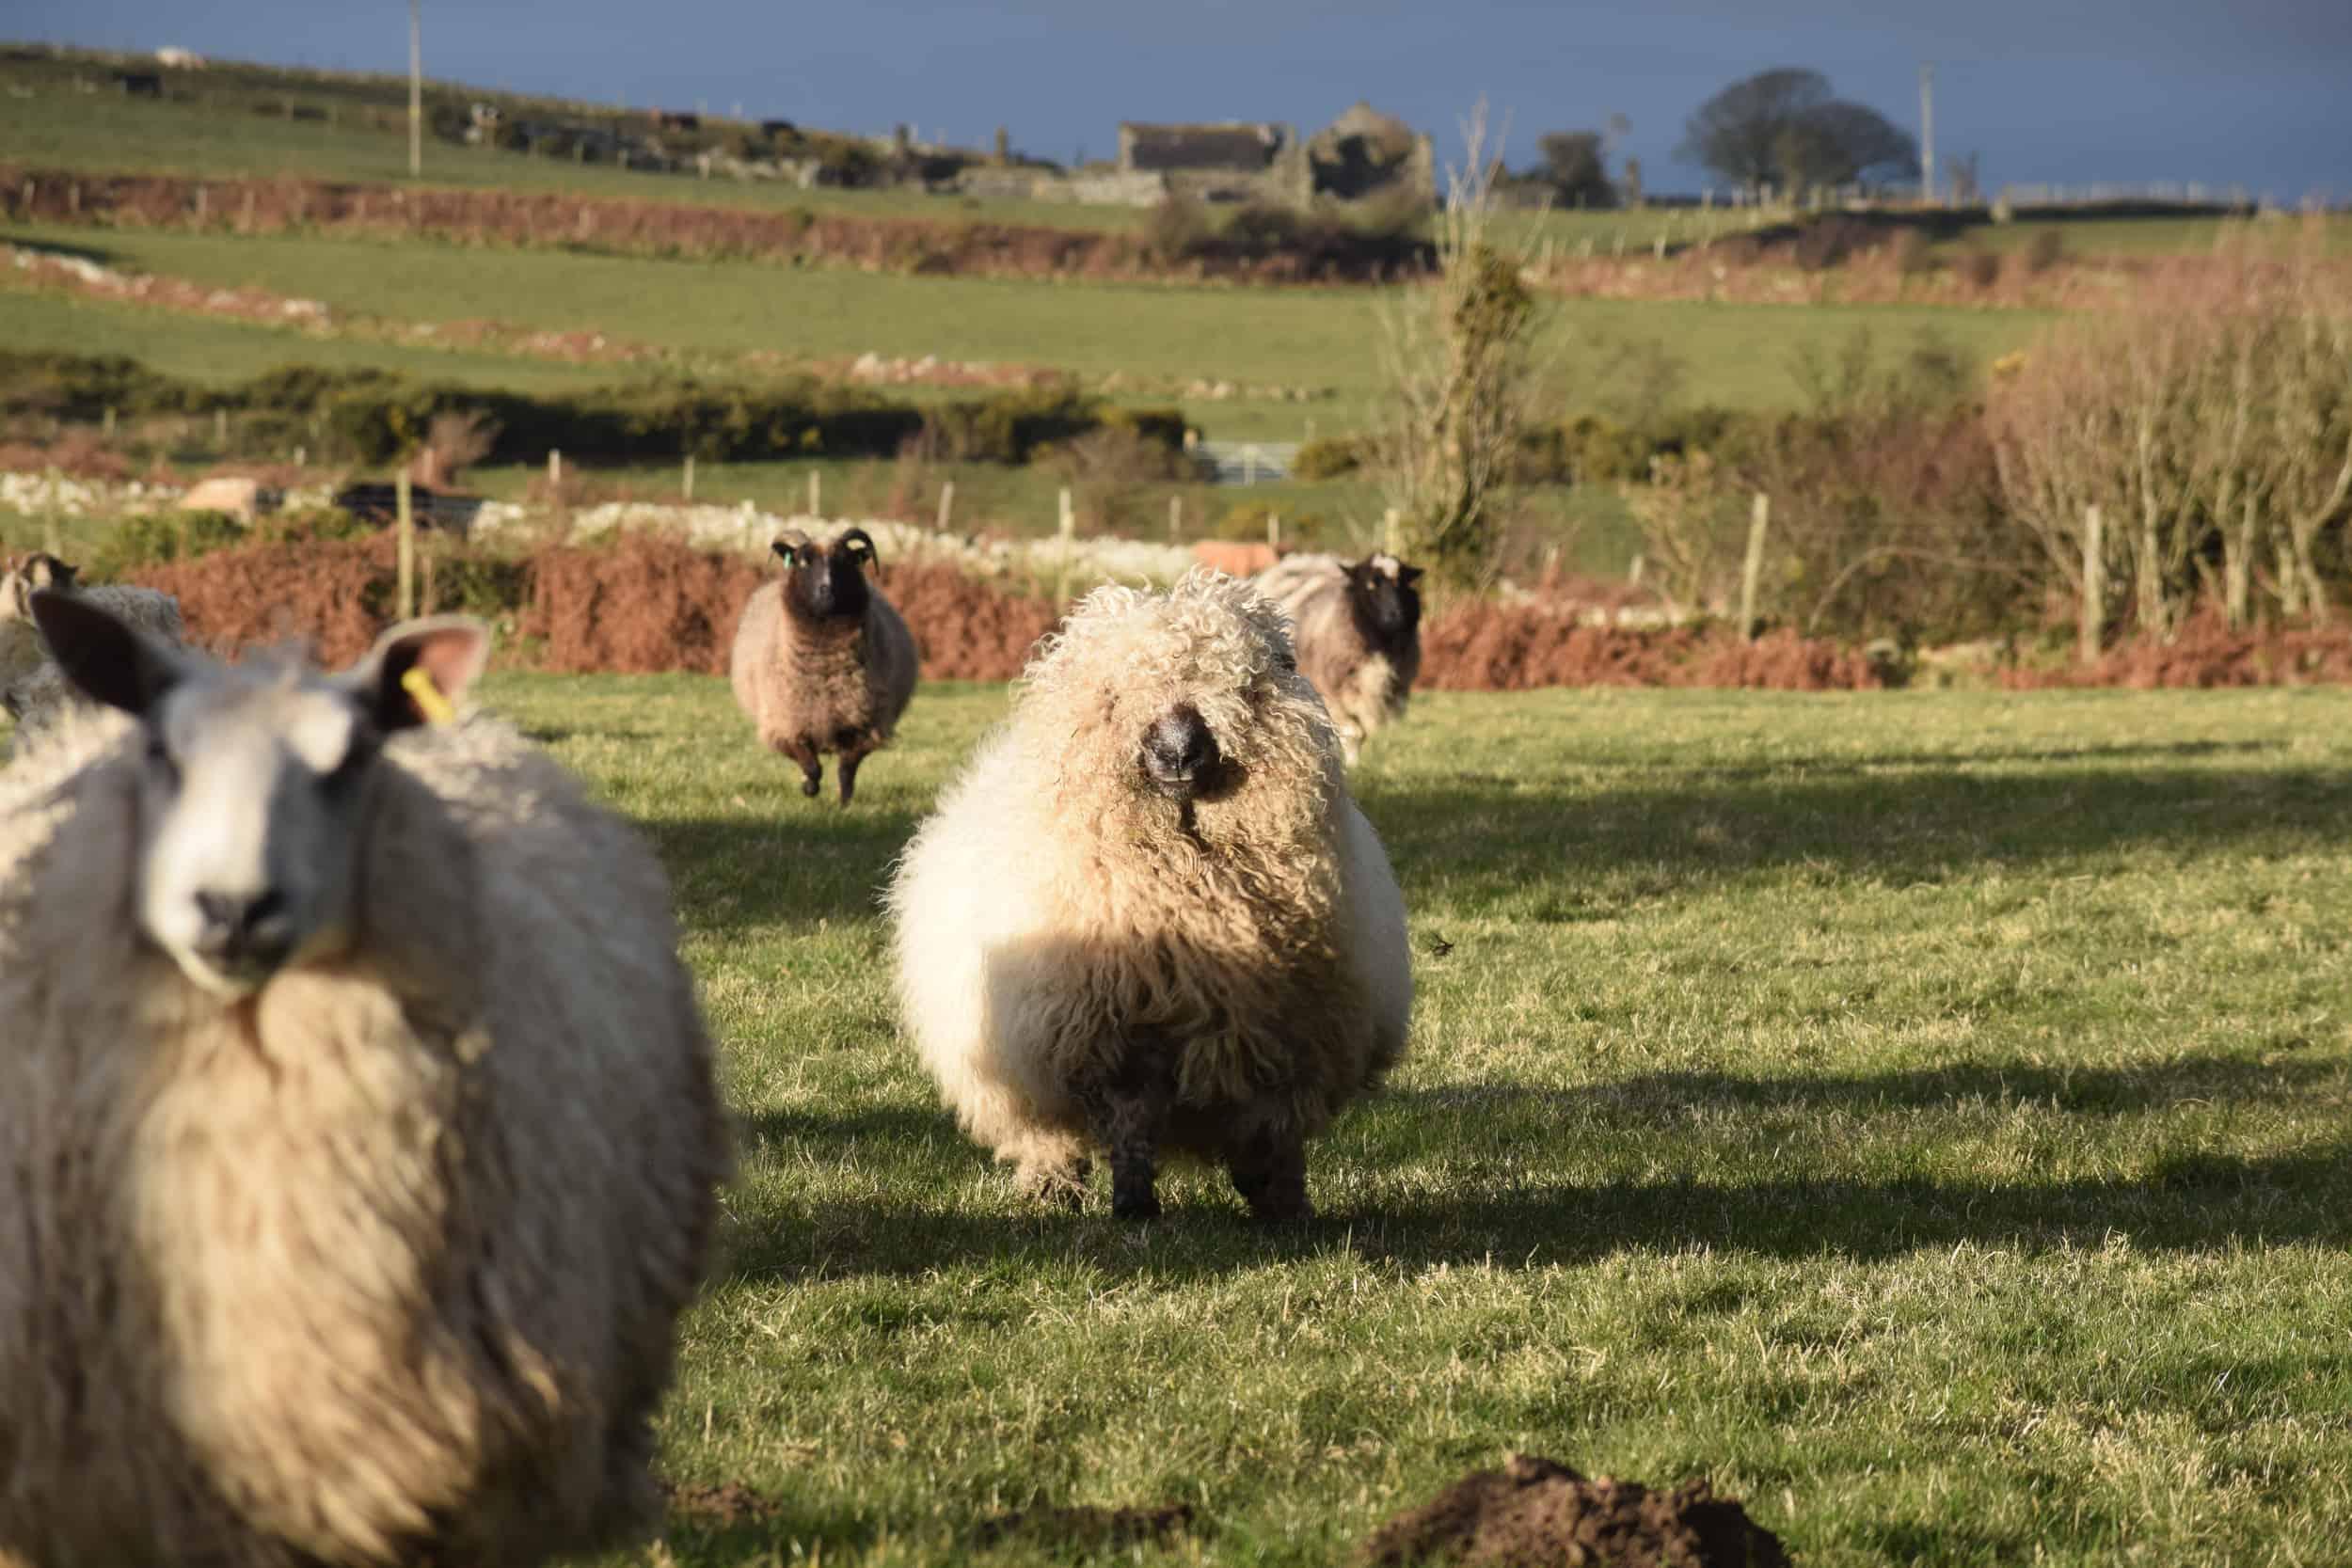 Nora valais blacknose greyface dartmoor pet sheep cuddle bear sheep patchworksheep crueltyfree felt rugs